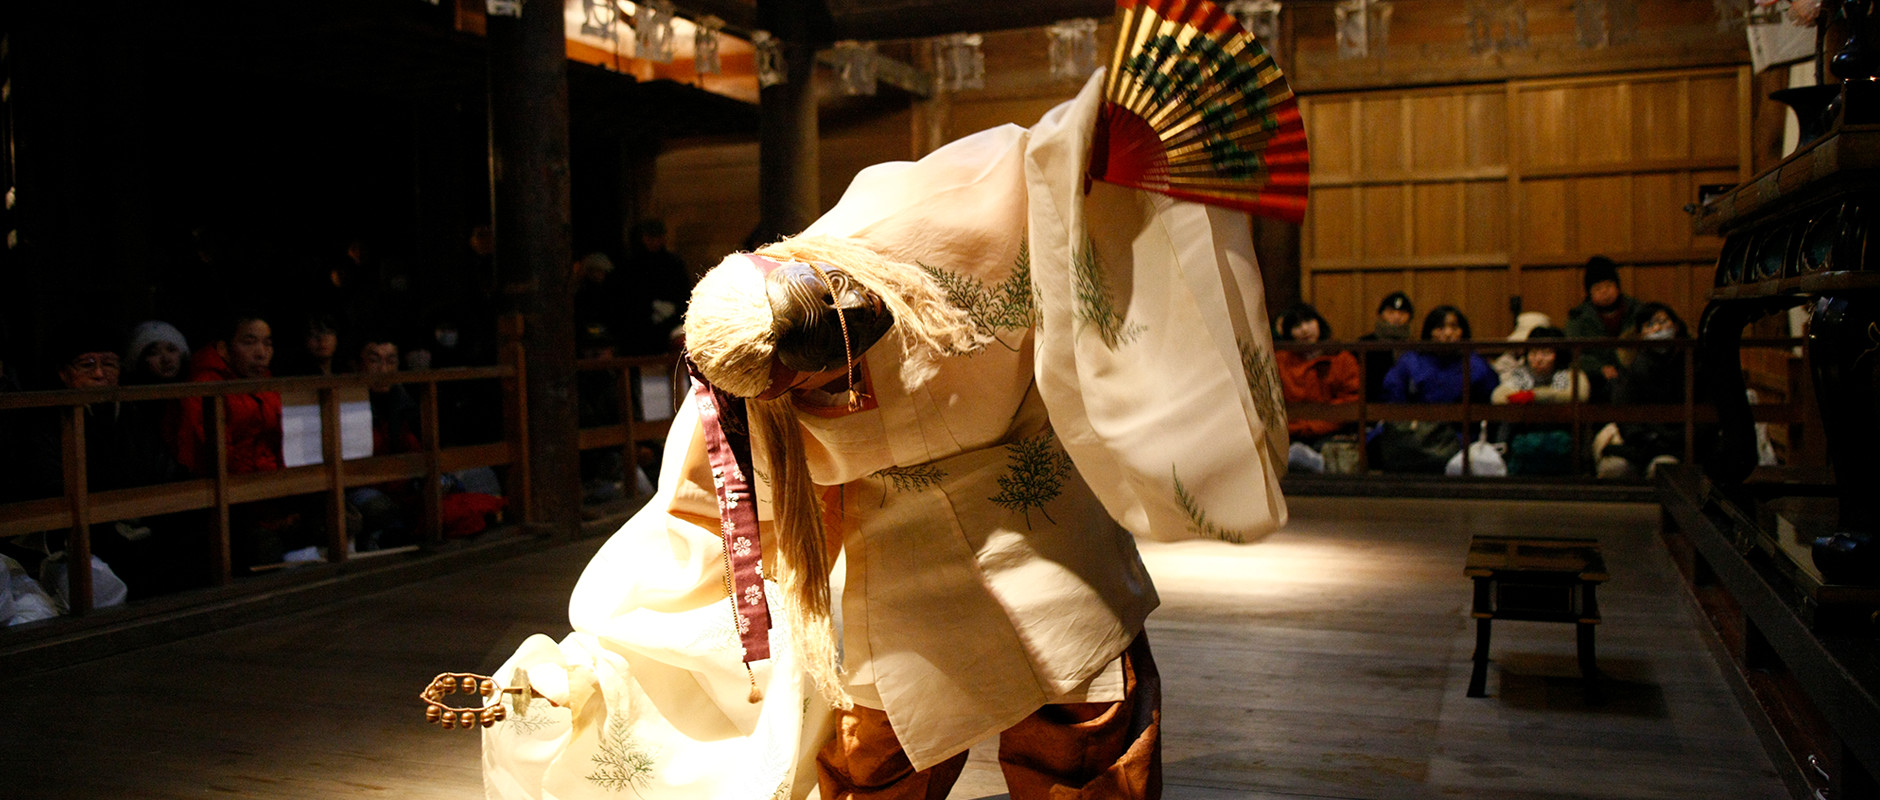 毛越寺の画像 p1_14